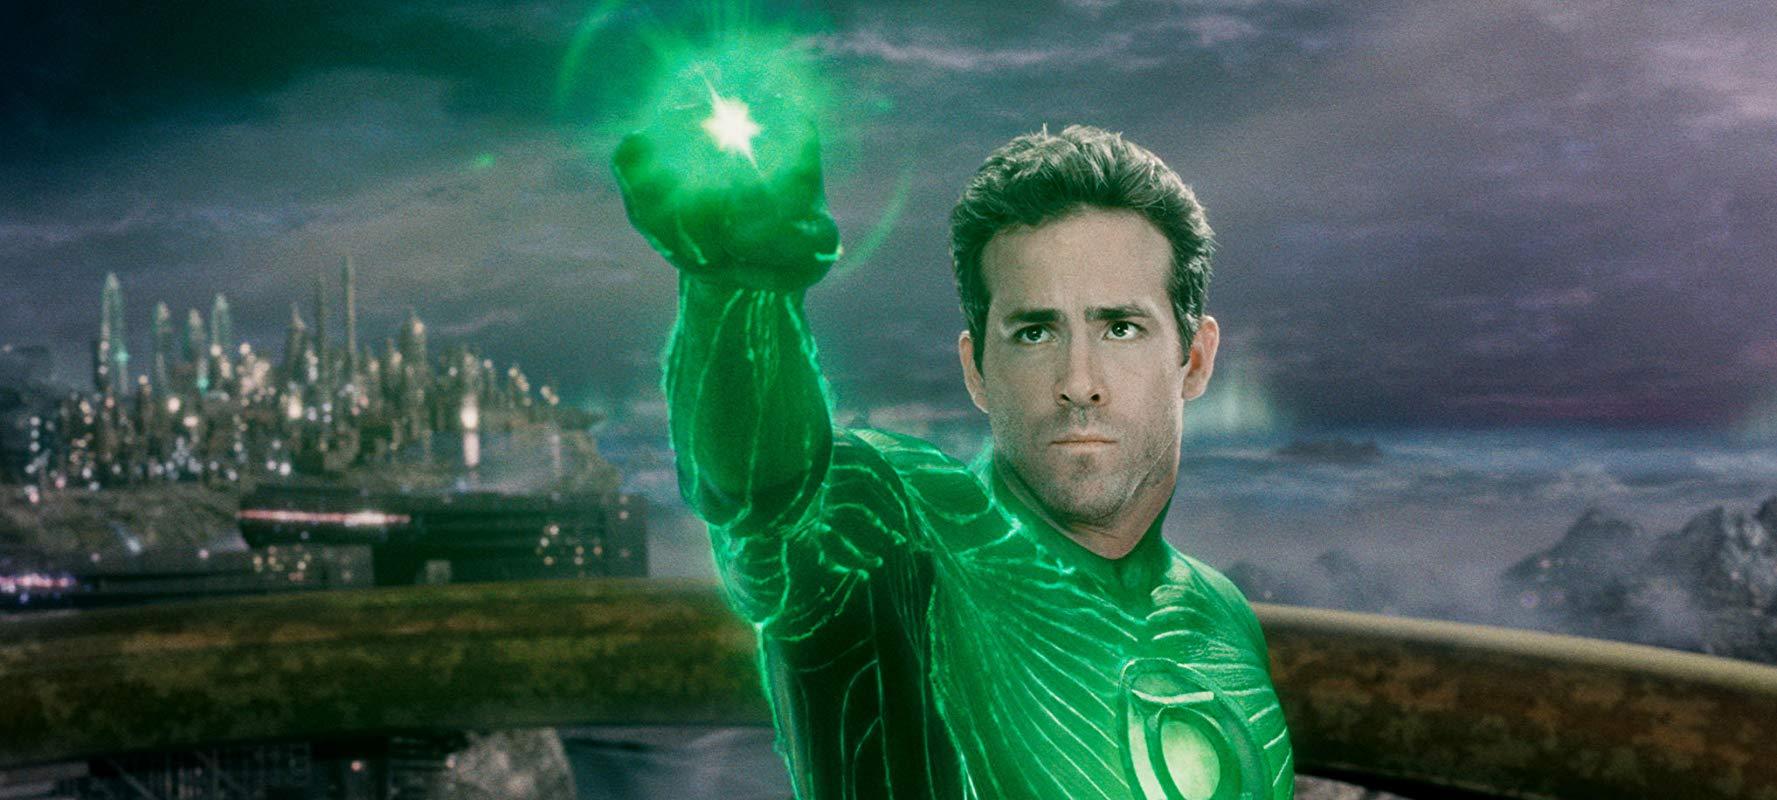 Ryan Reynolds em Lanterna Verde - 2011 (Fonte: IMDb/Reprodução)